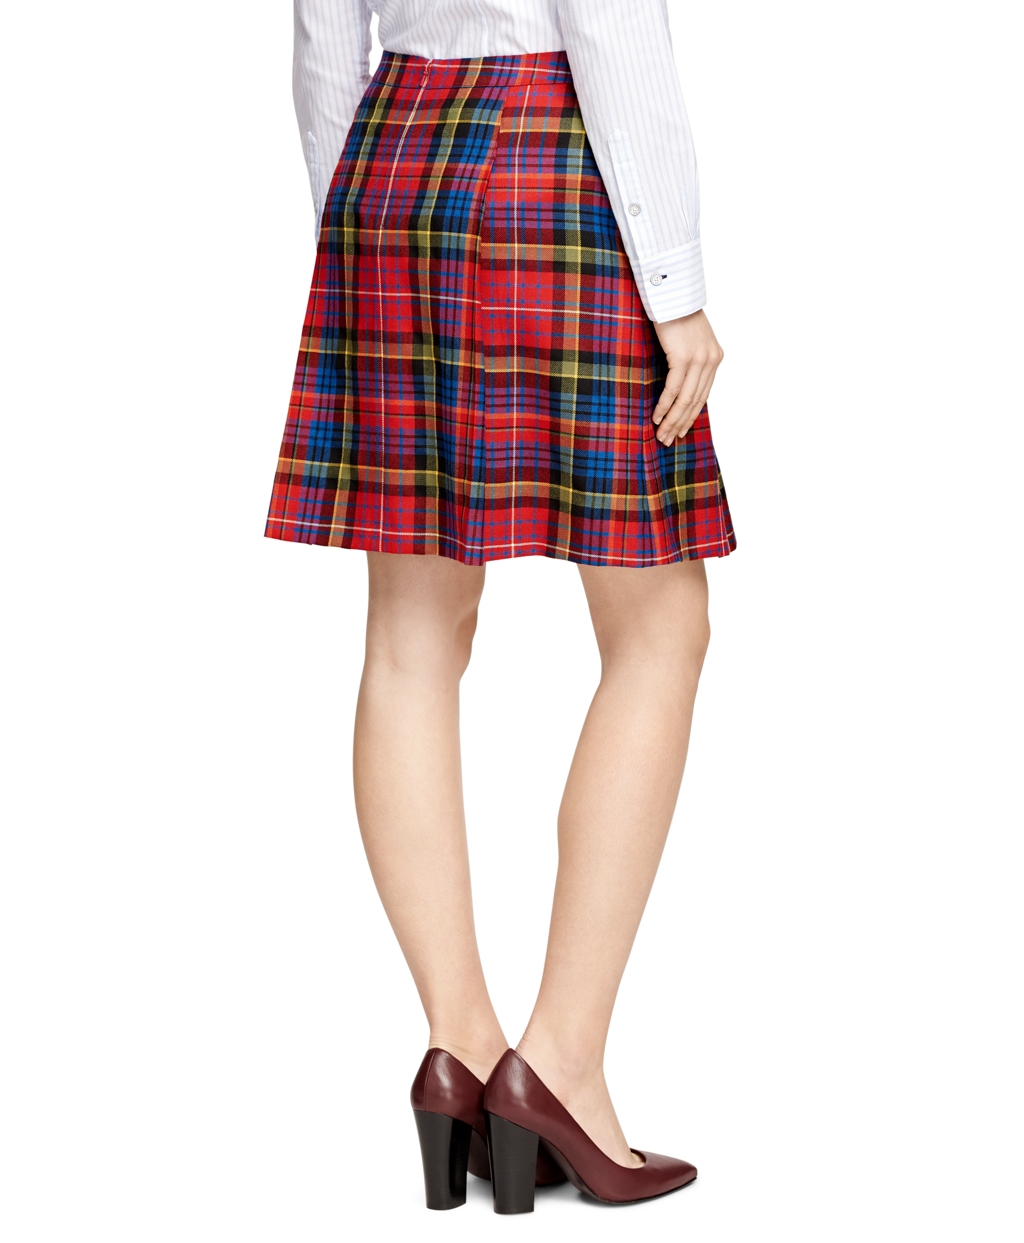 Brooks brothers Wool Tartan Plaid Skirt | Lyst